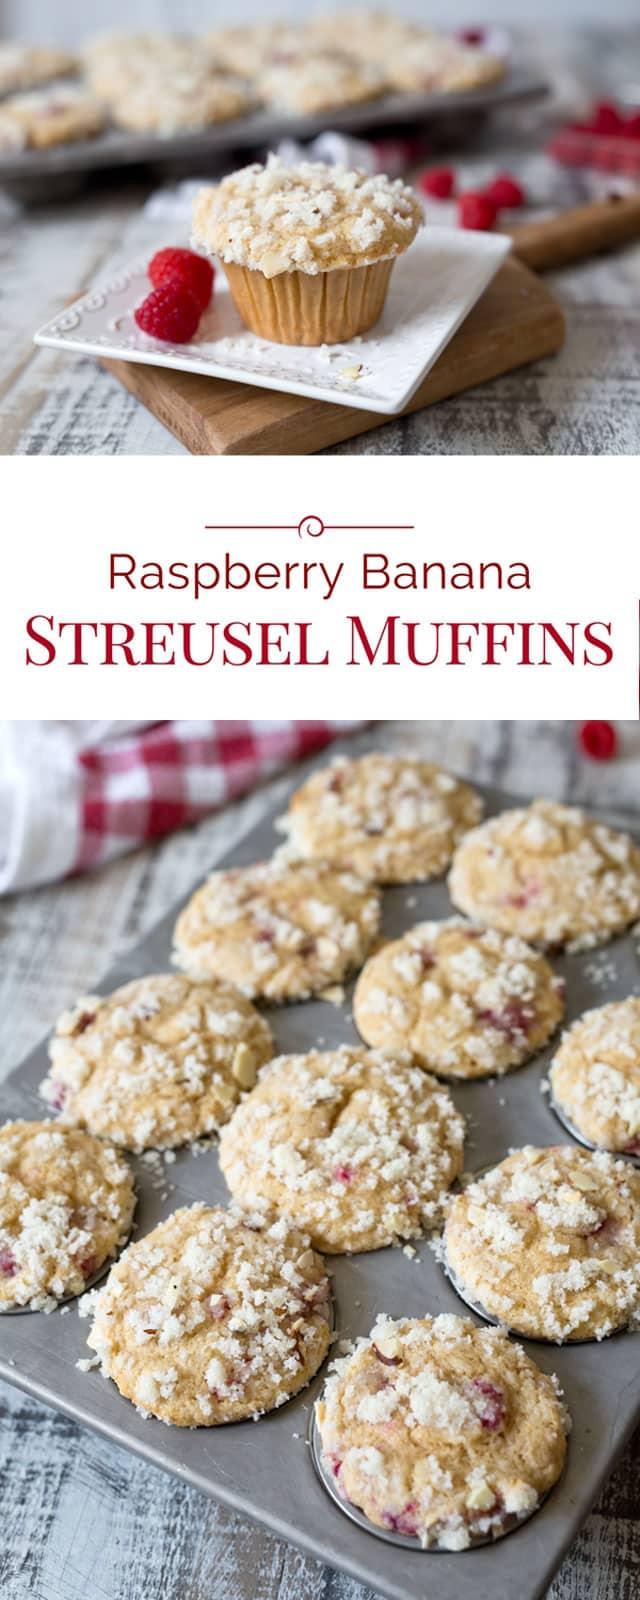 Raspberry-Banana-Streusel-Muffins-Collage-Barbara-Bakes